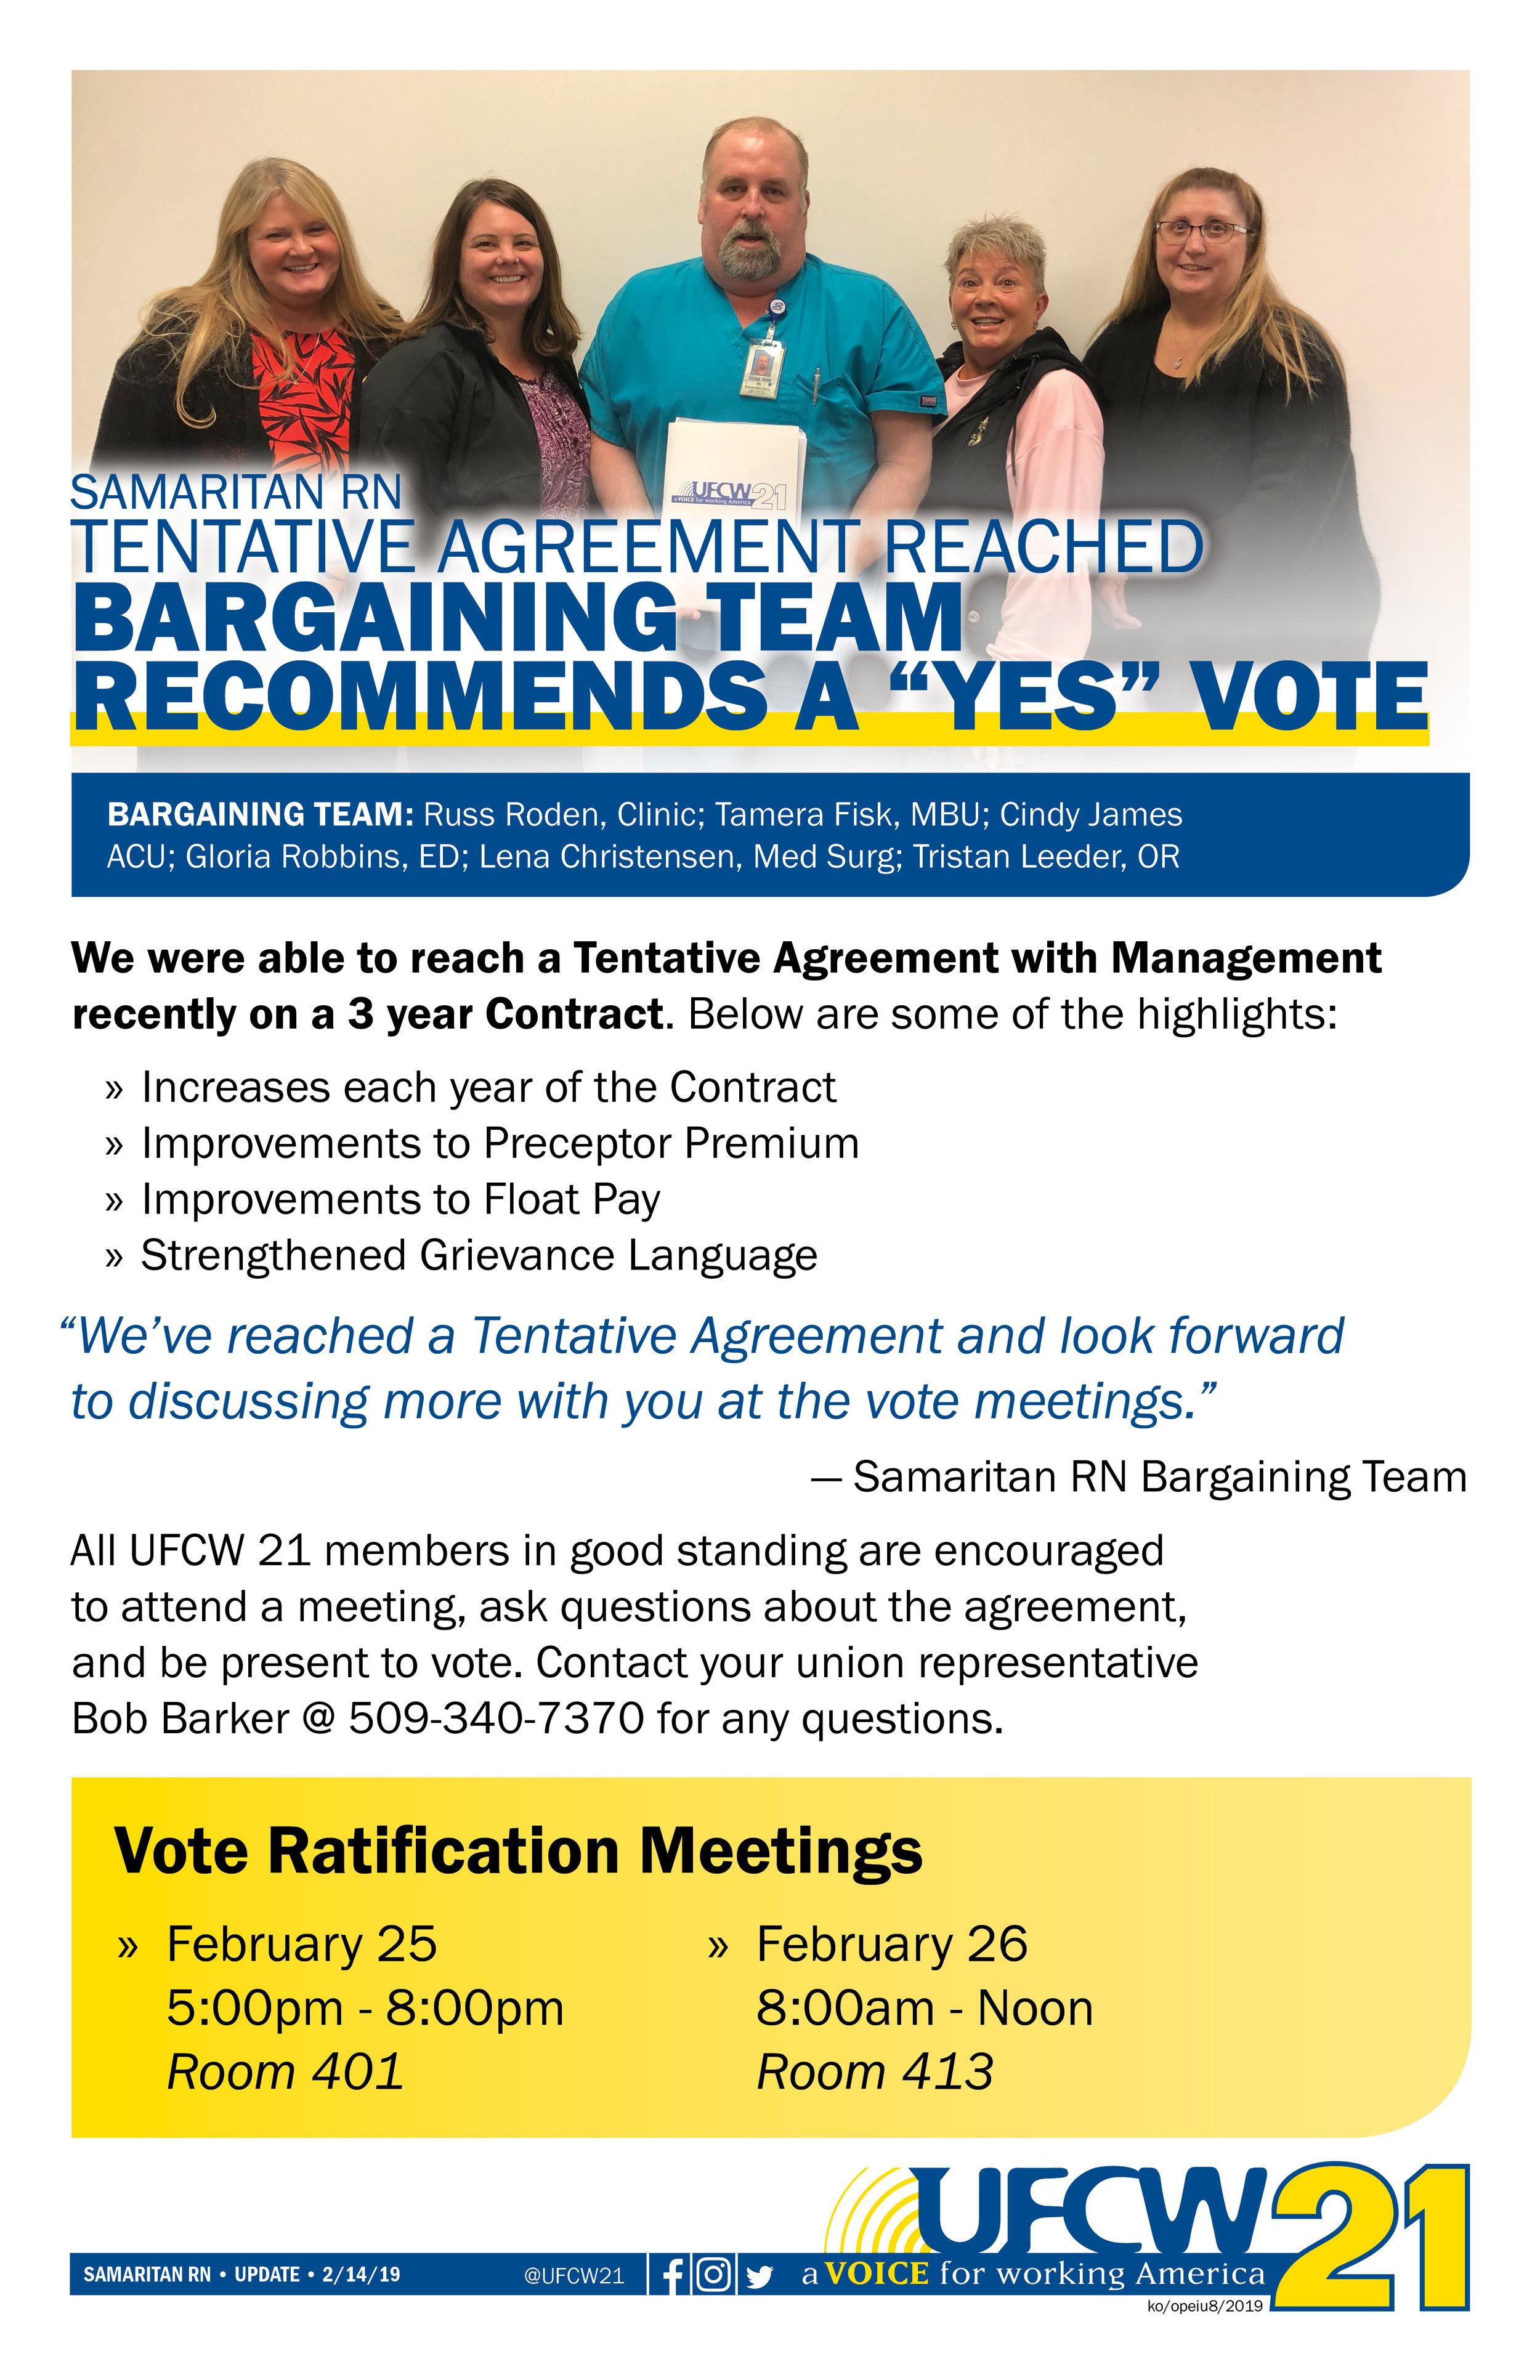 2019 0214 - Samaritan RN Tentative Agreement.jpg